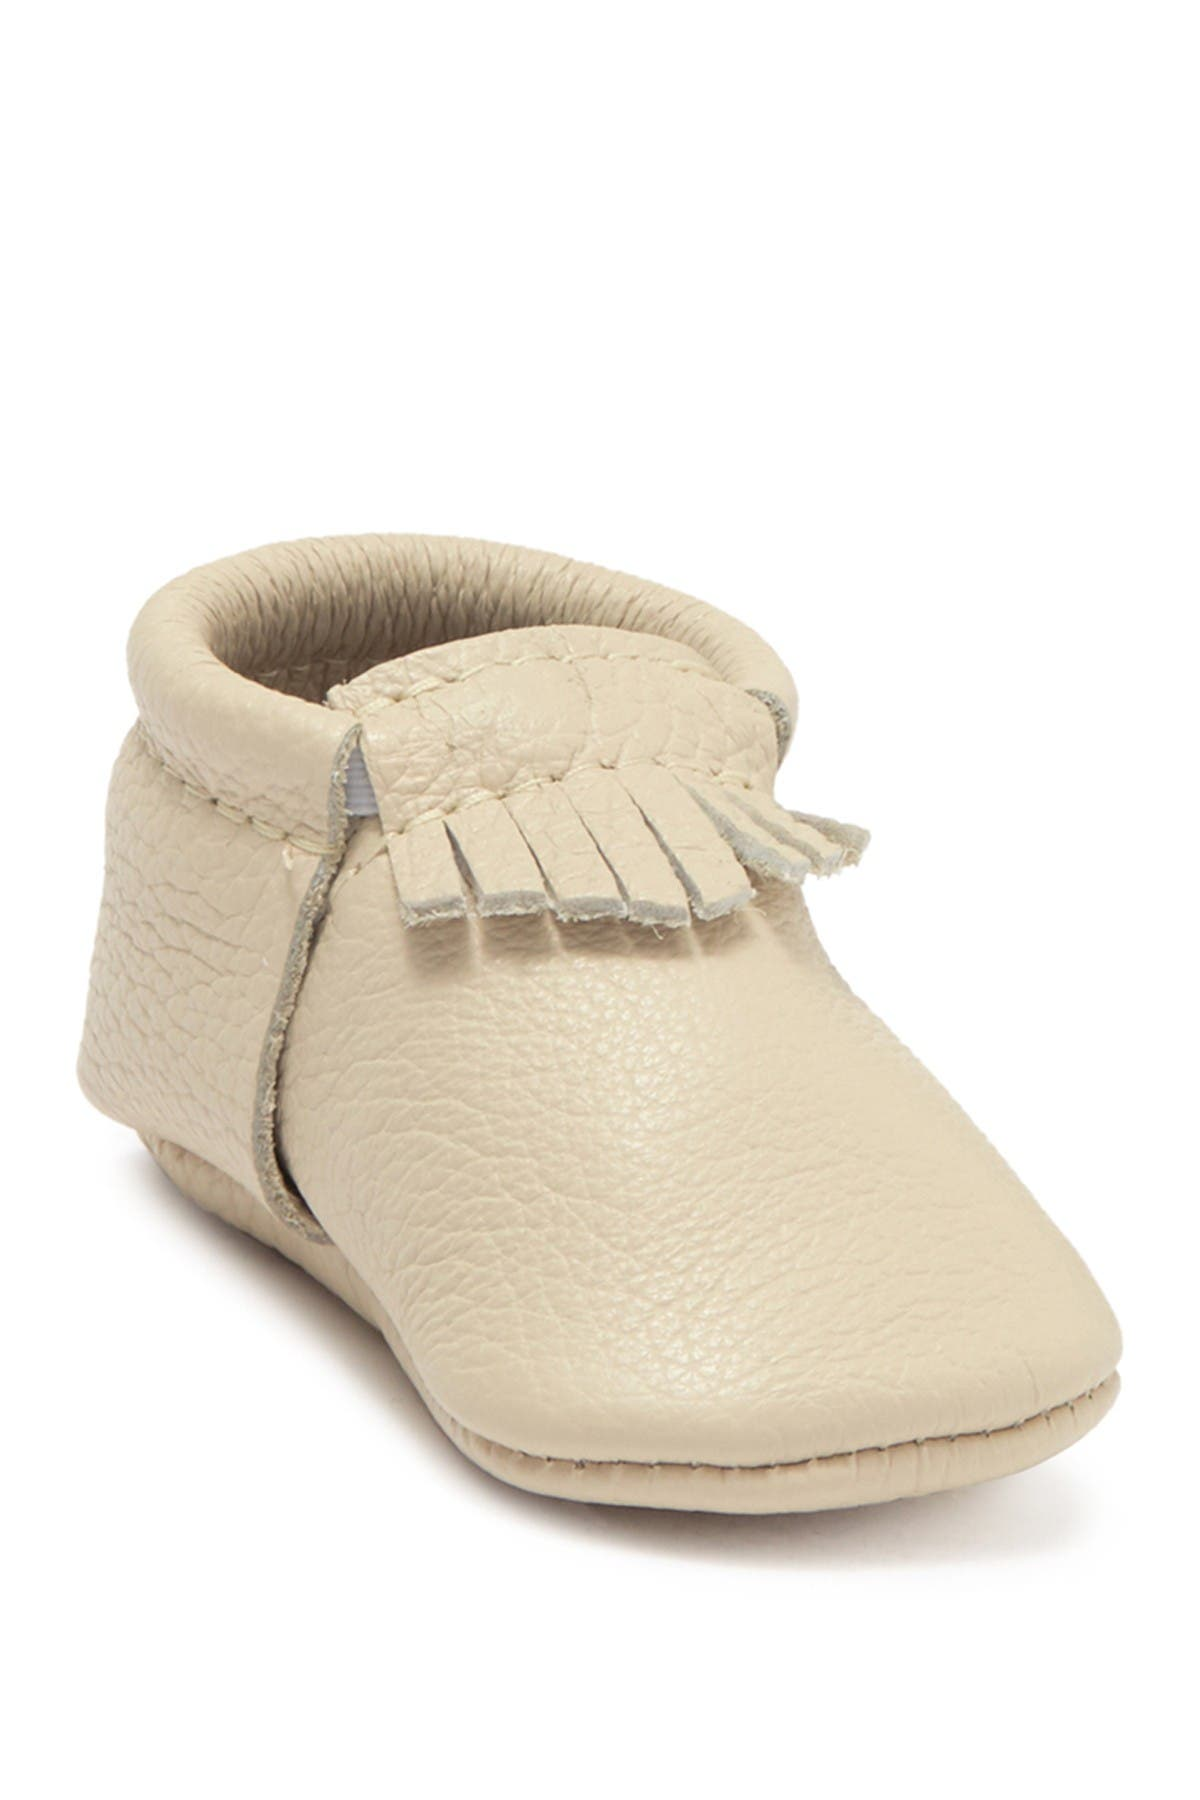 Image of Freshly Picked First Pair Fringe Slip-On Shoe